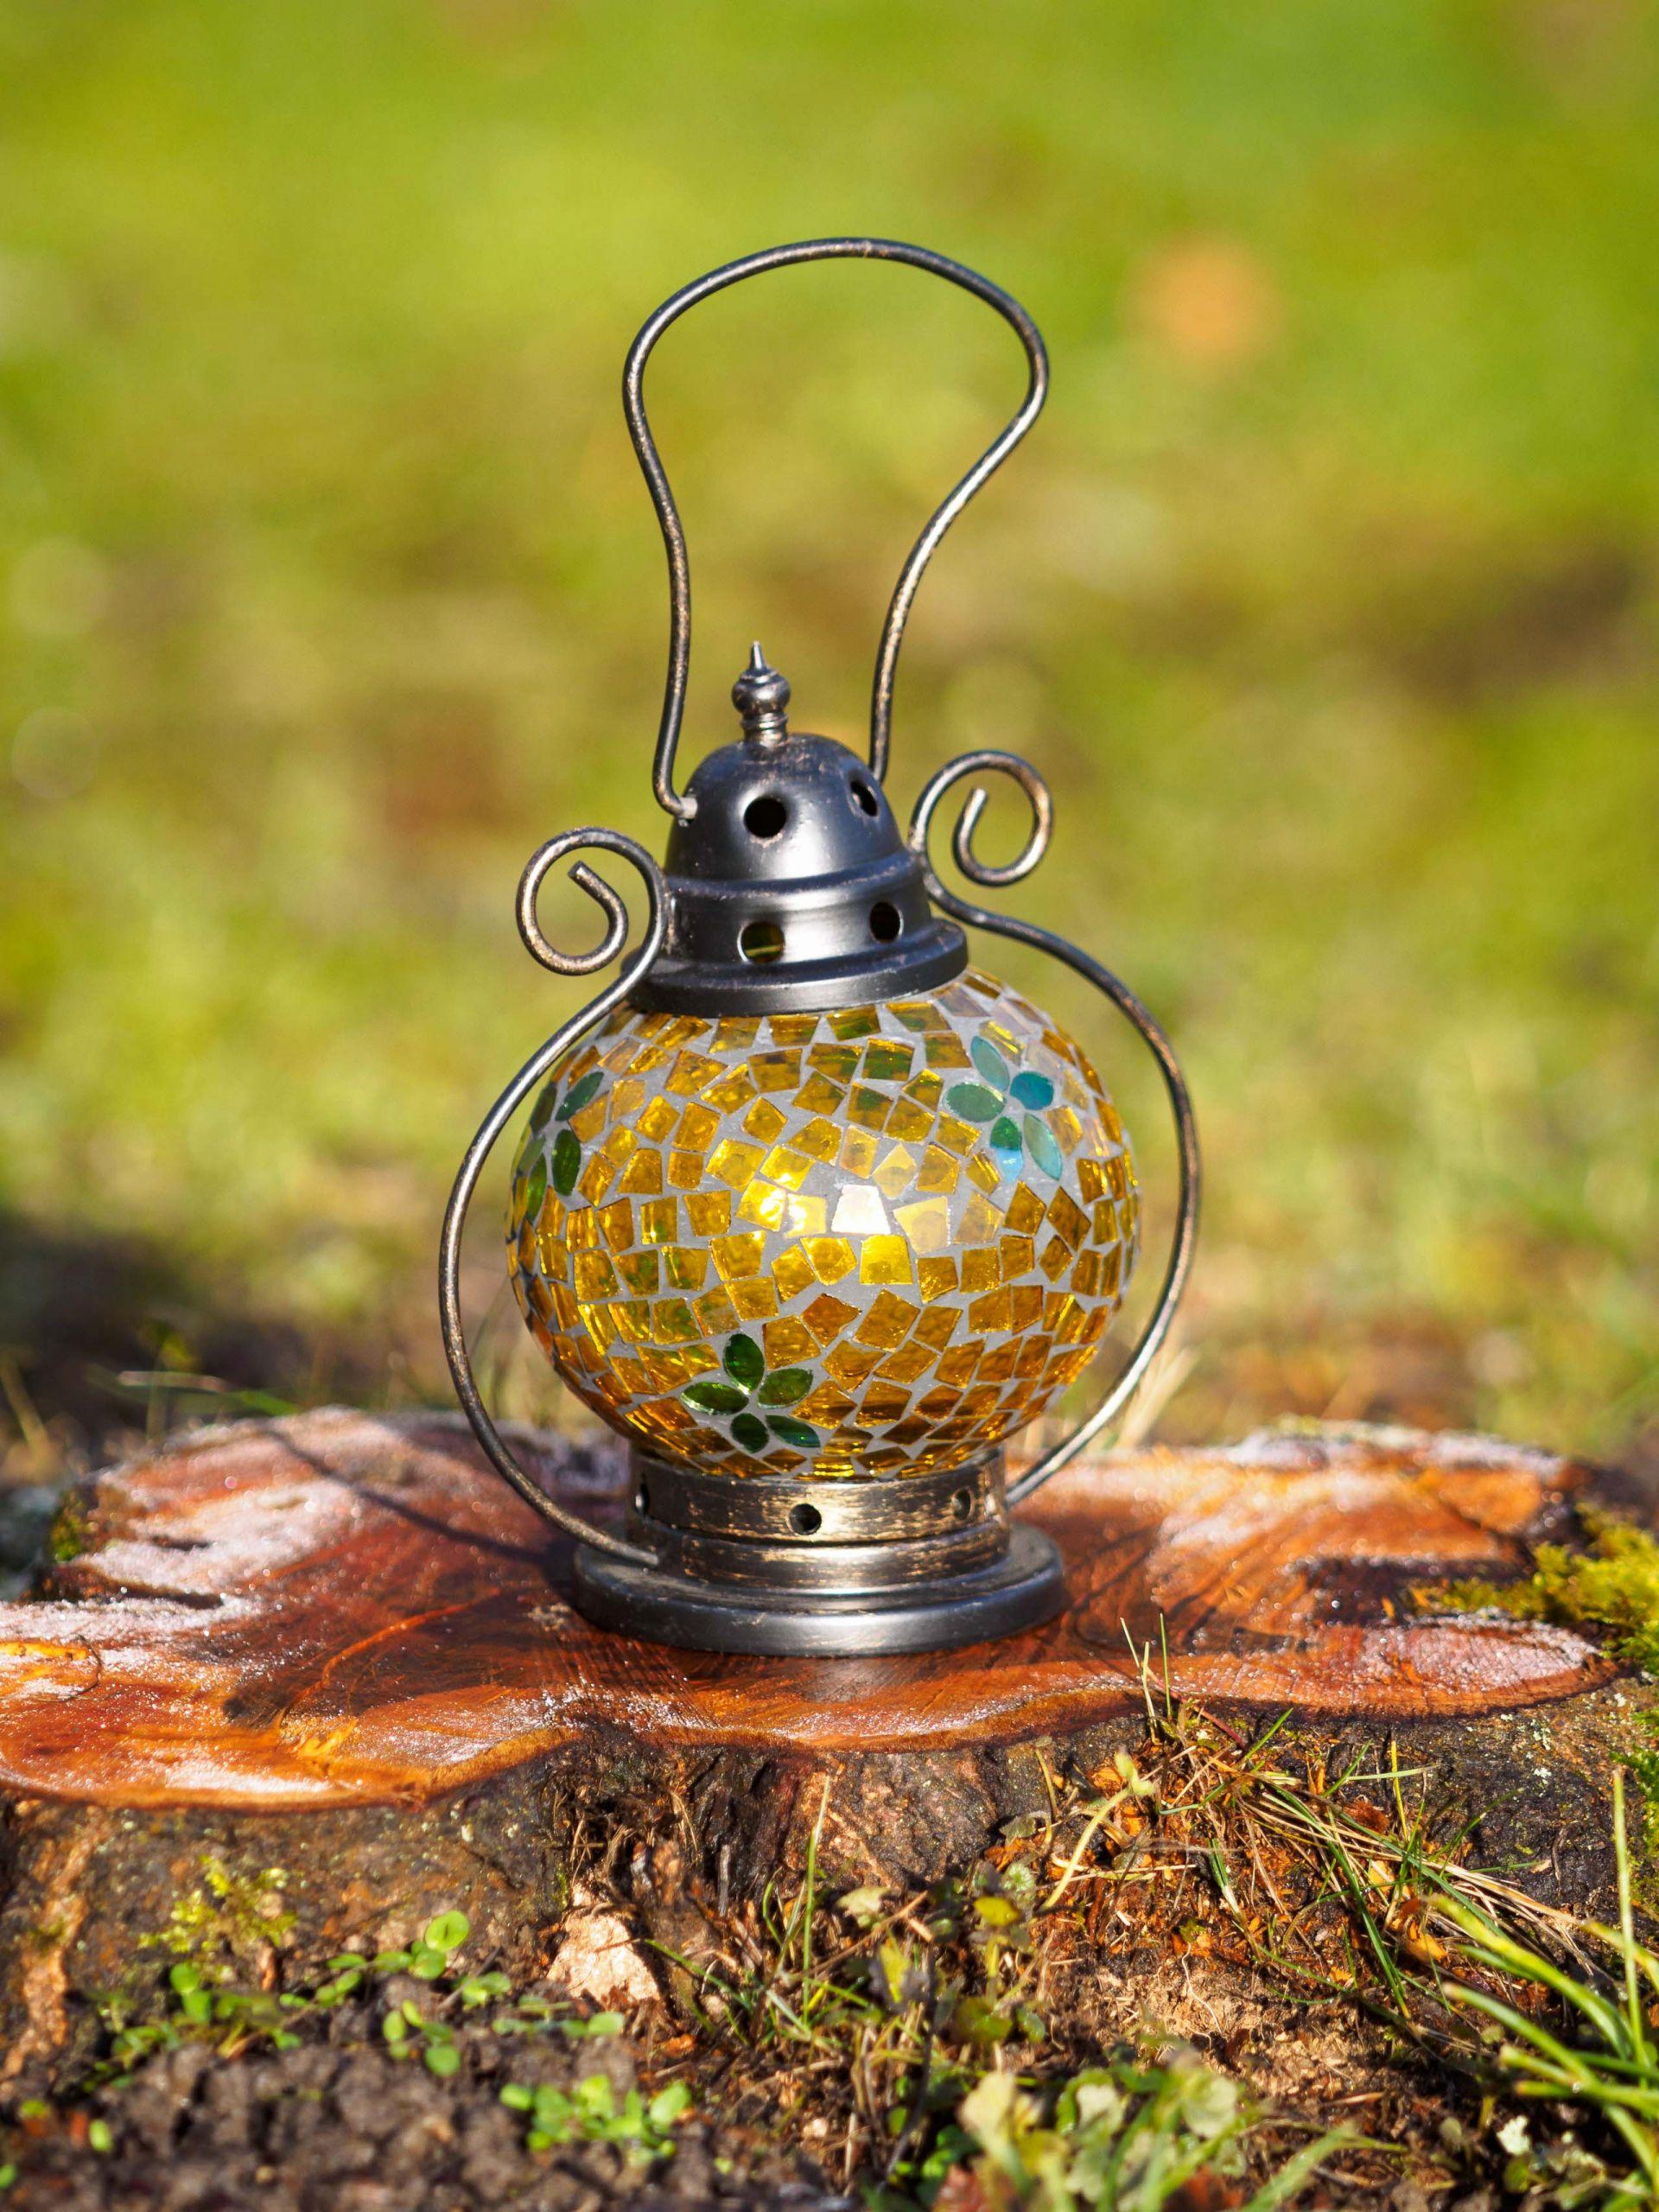 metal garden spheres awesome windlicht laterne lampe teelicht garten terasse haus glas buntglas of metal garden spheres